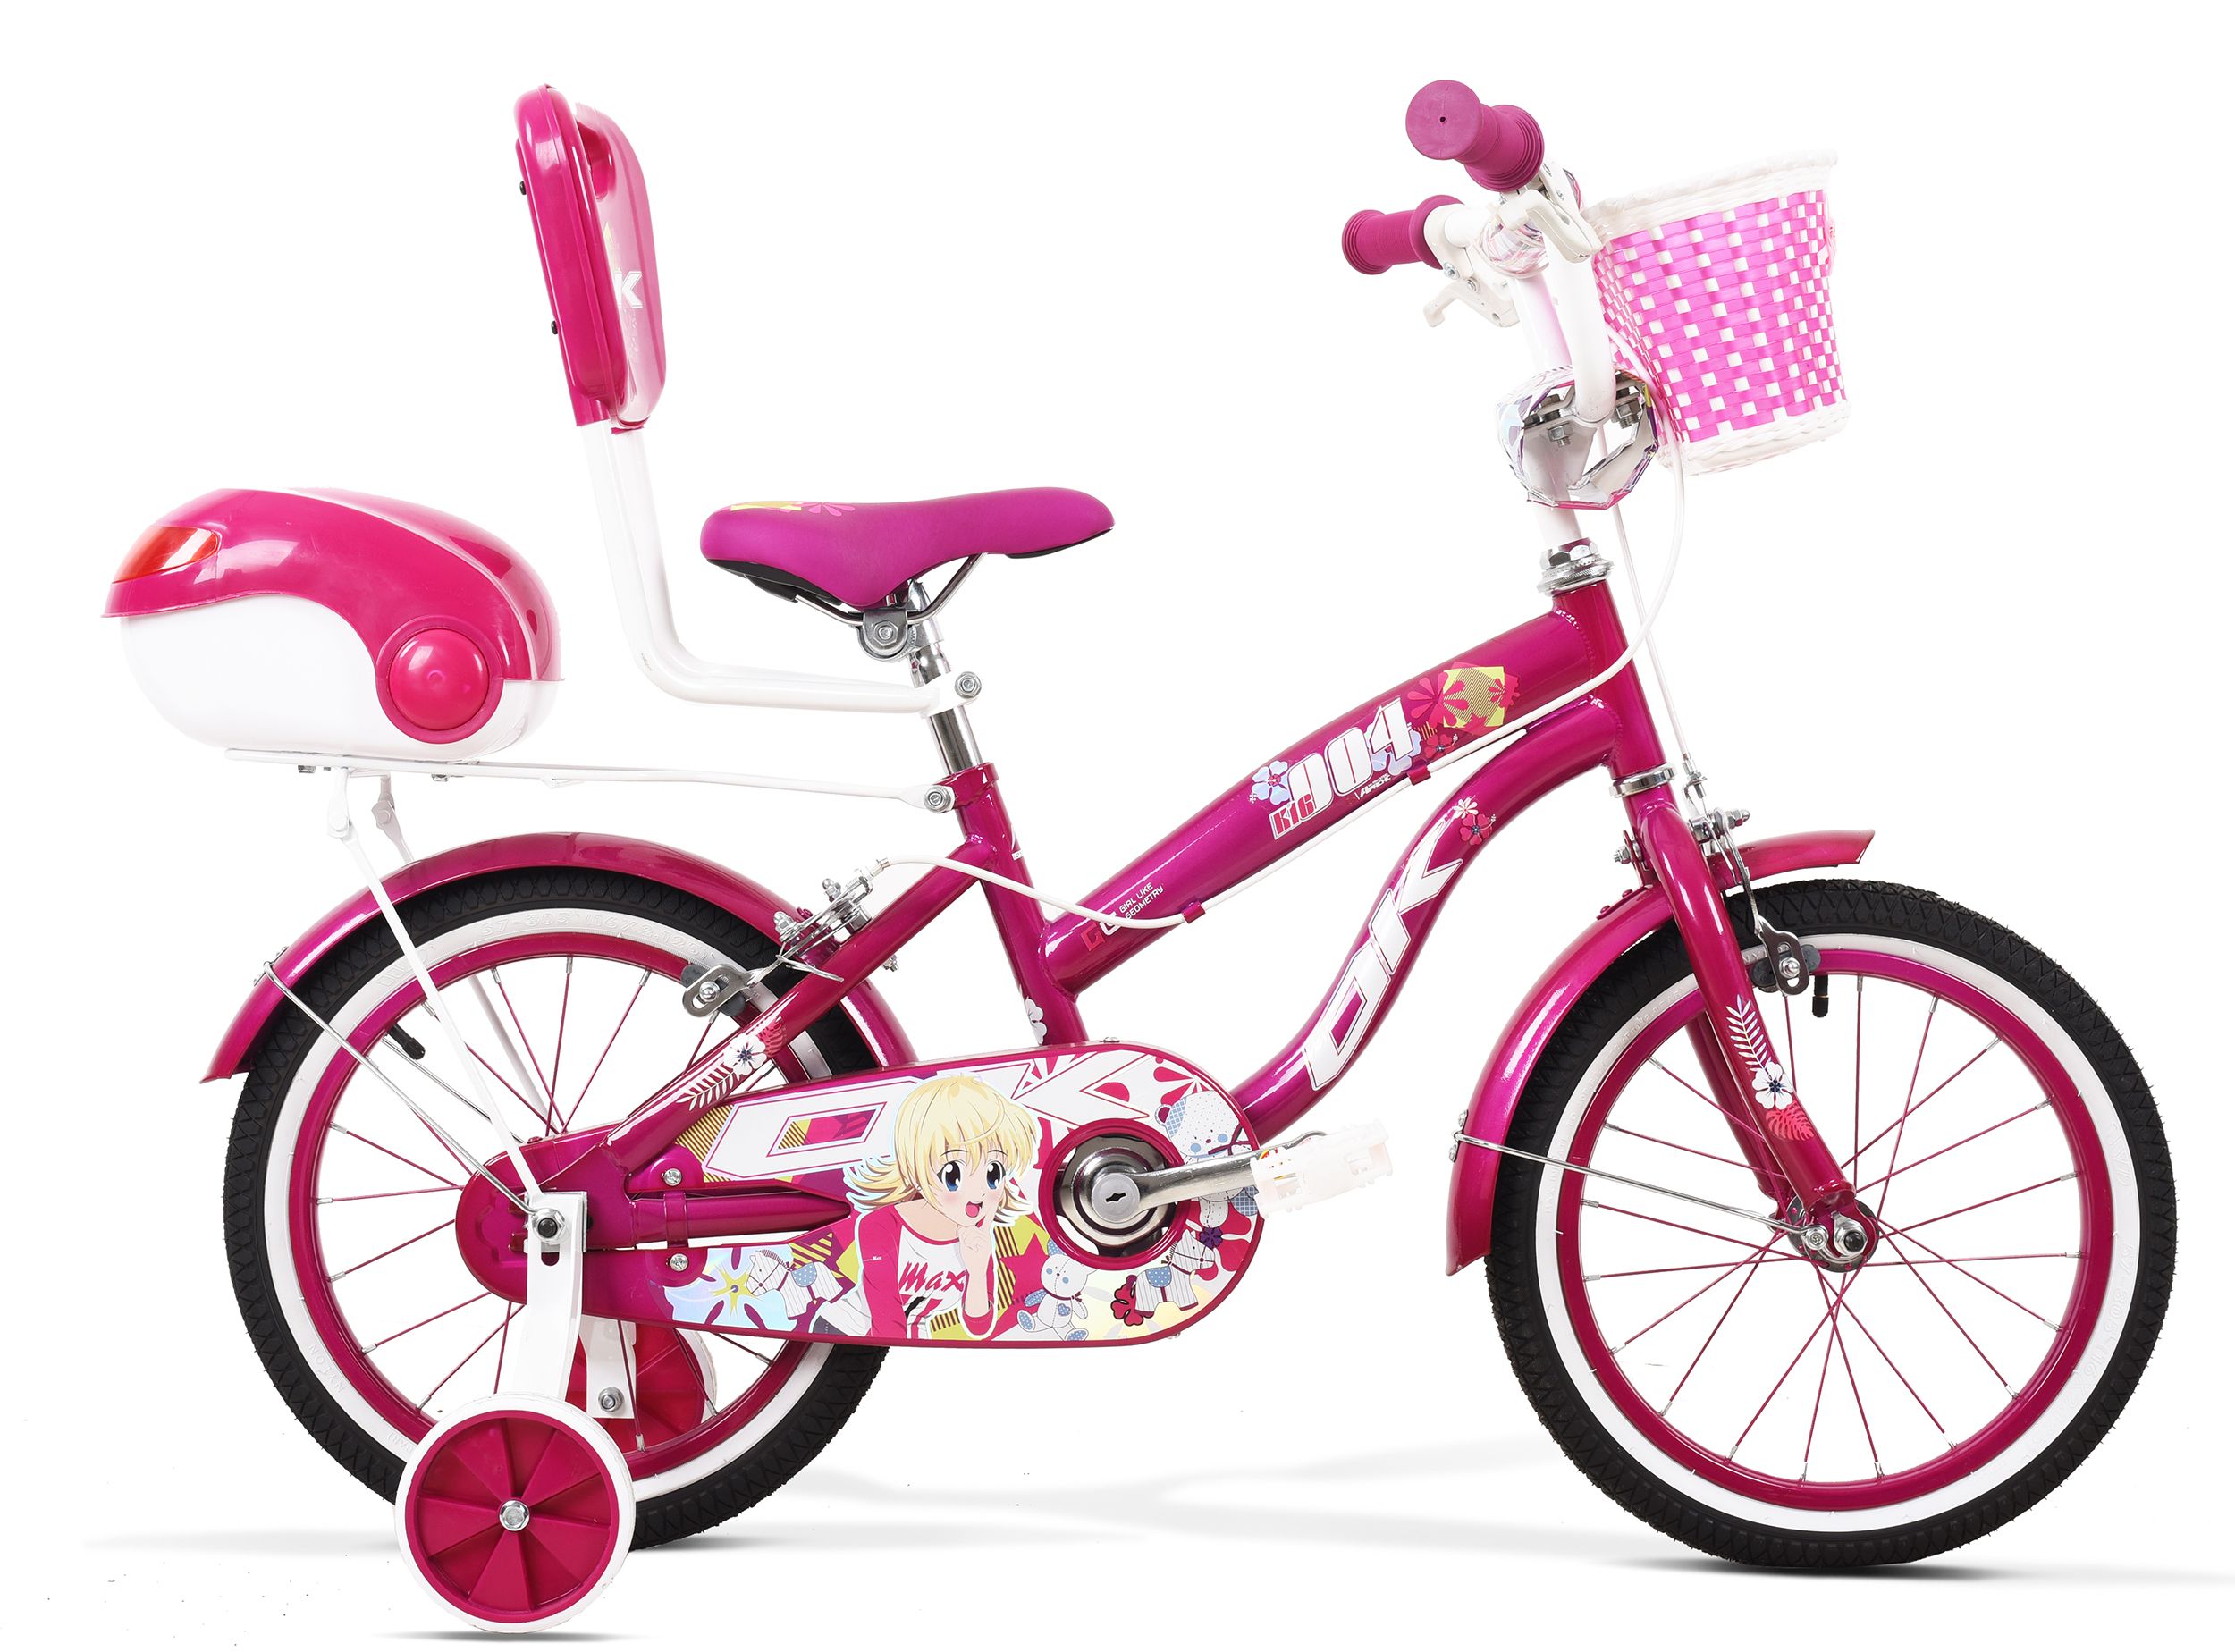 دوچرخه سایز 16 مدل K16004HR